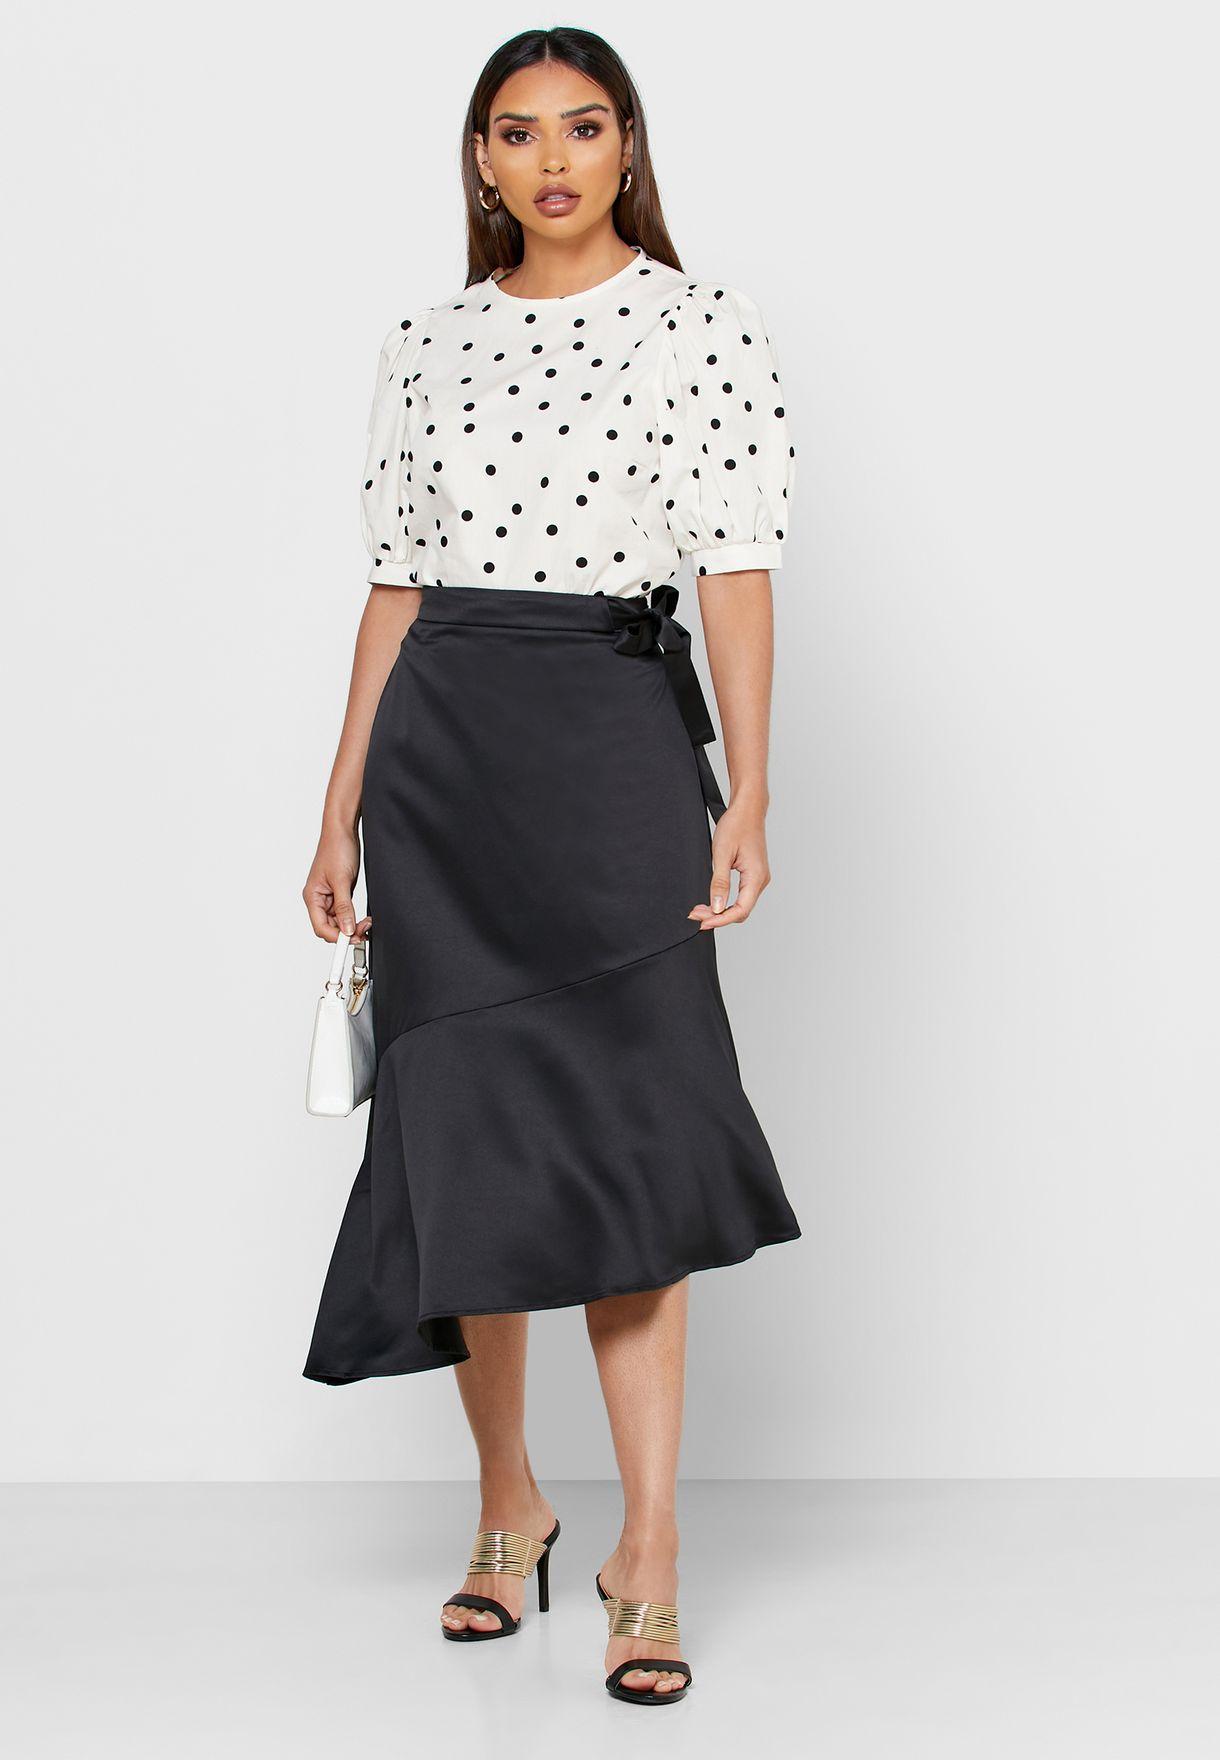 Seam Detail Skirt